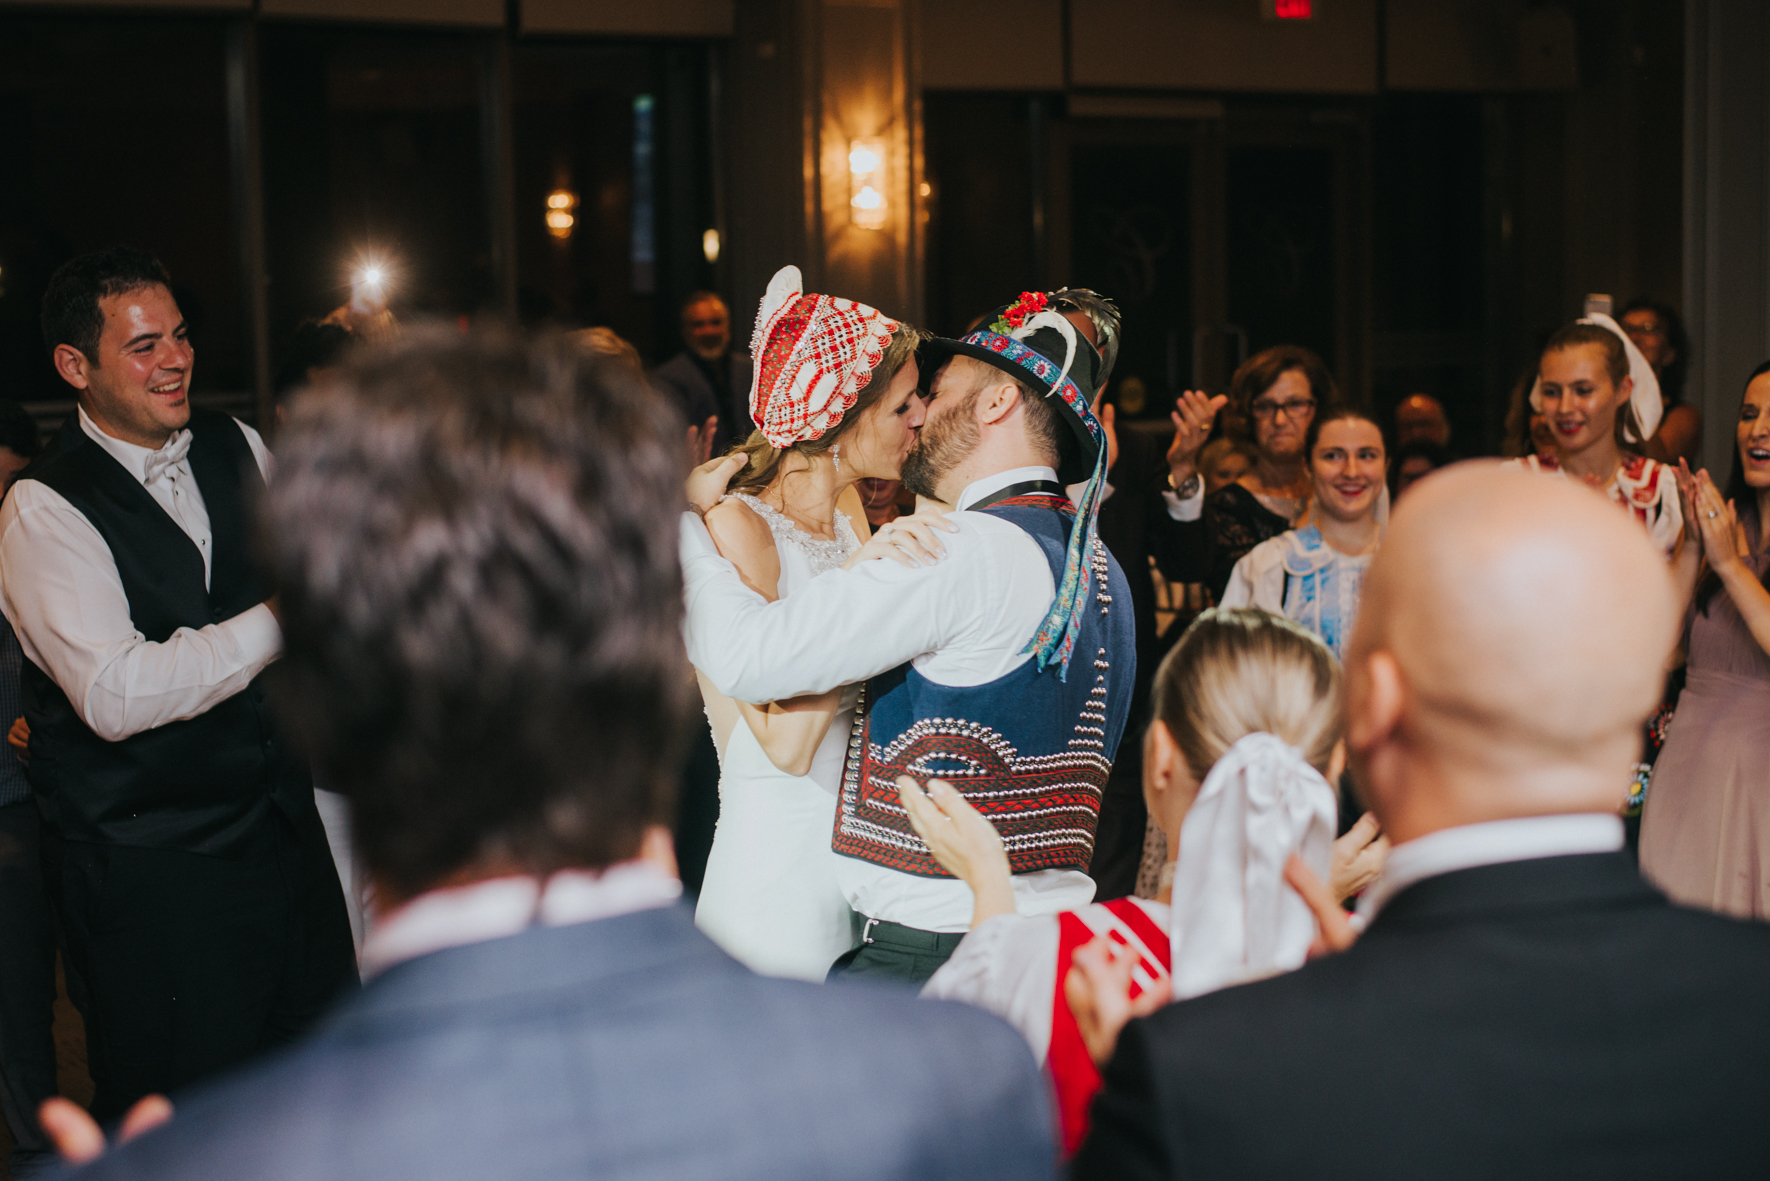 sandy-jana-copper-creek-golf-club-slovak-wedding-toronto-scandaleuse-photography-weddings-44.jpg